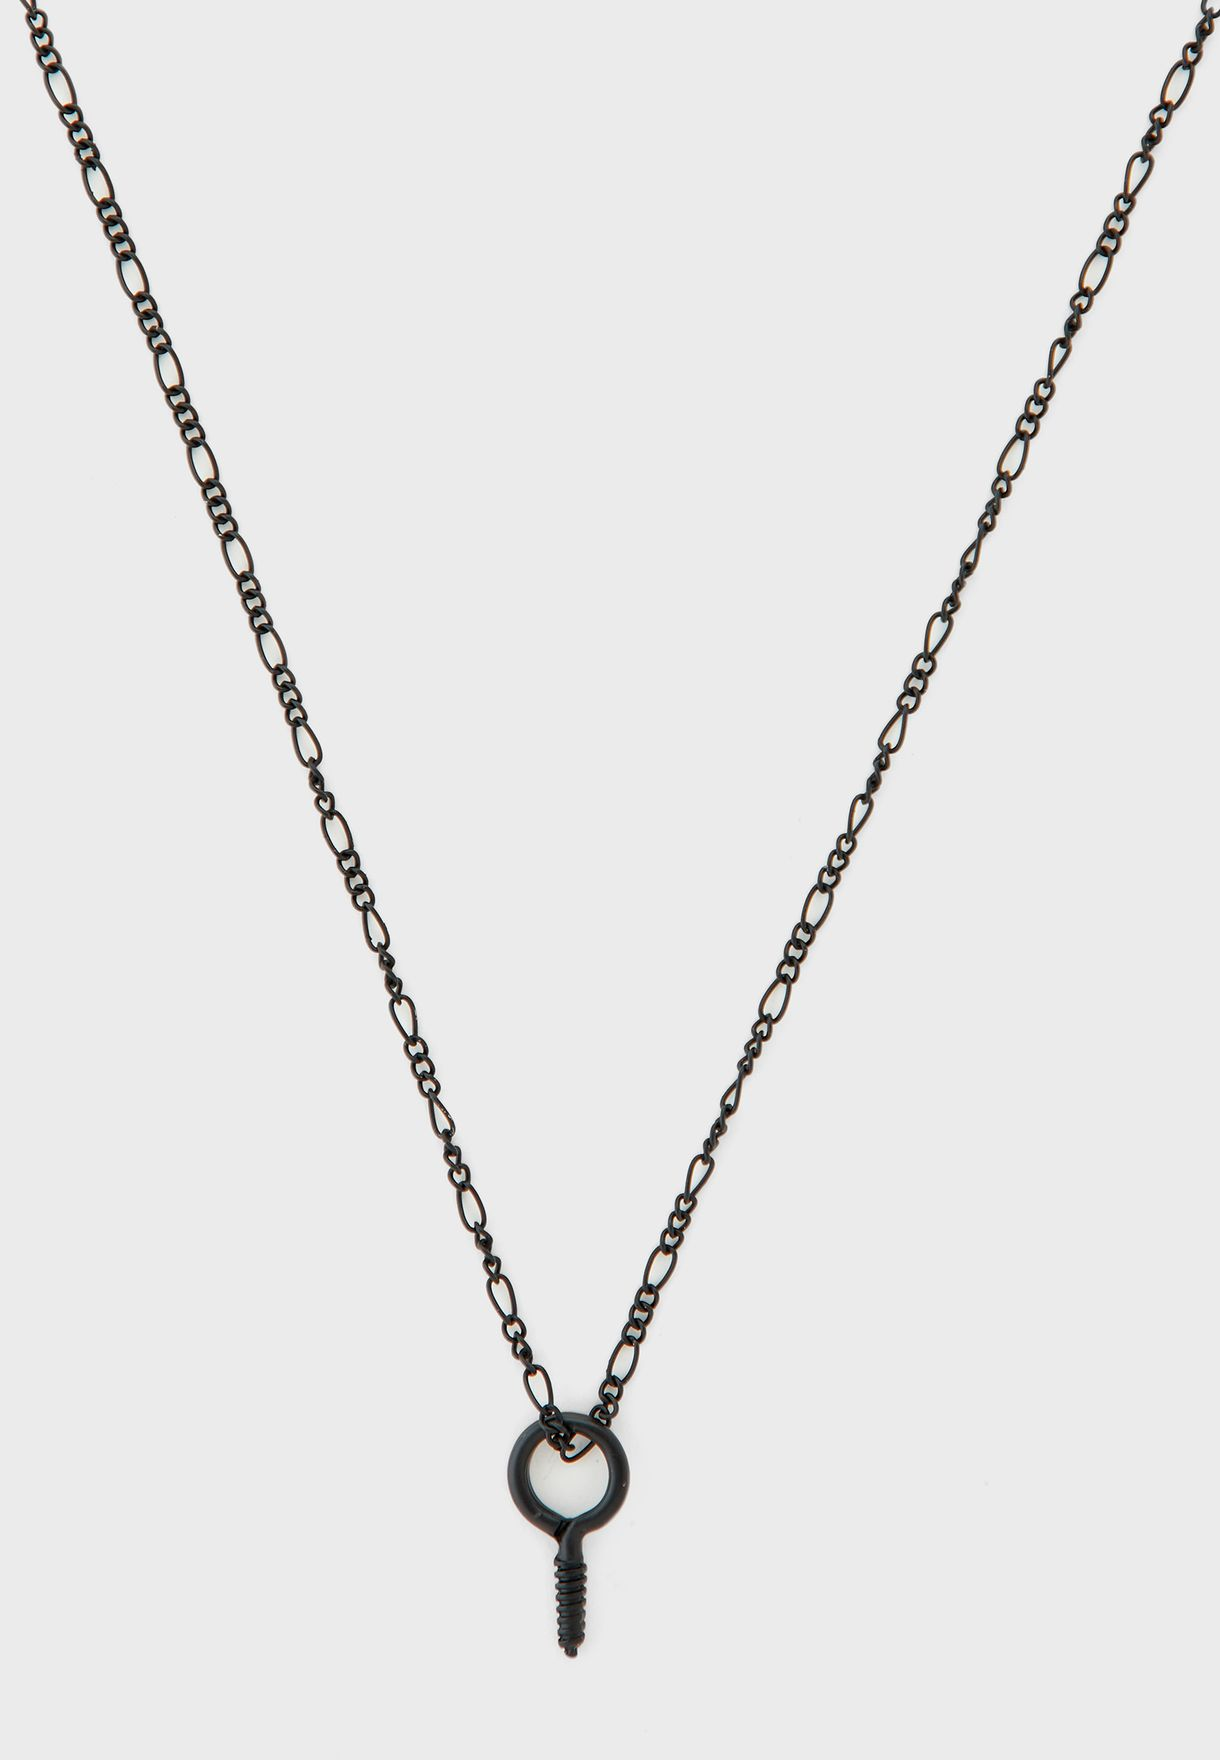 Conversational Industrial Necklace